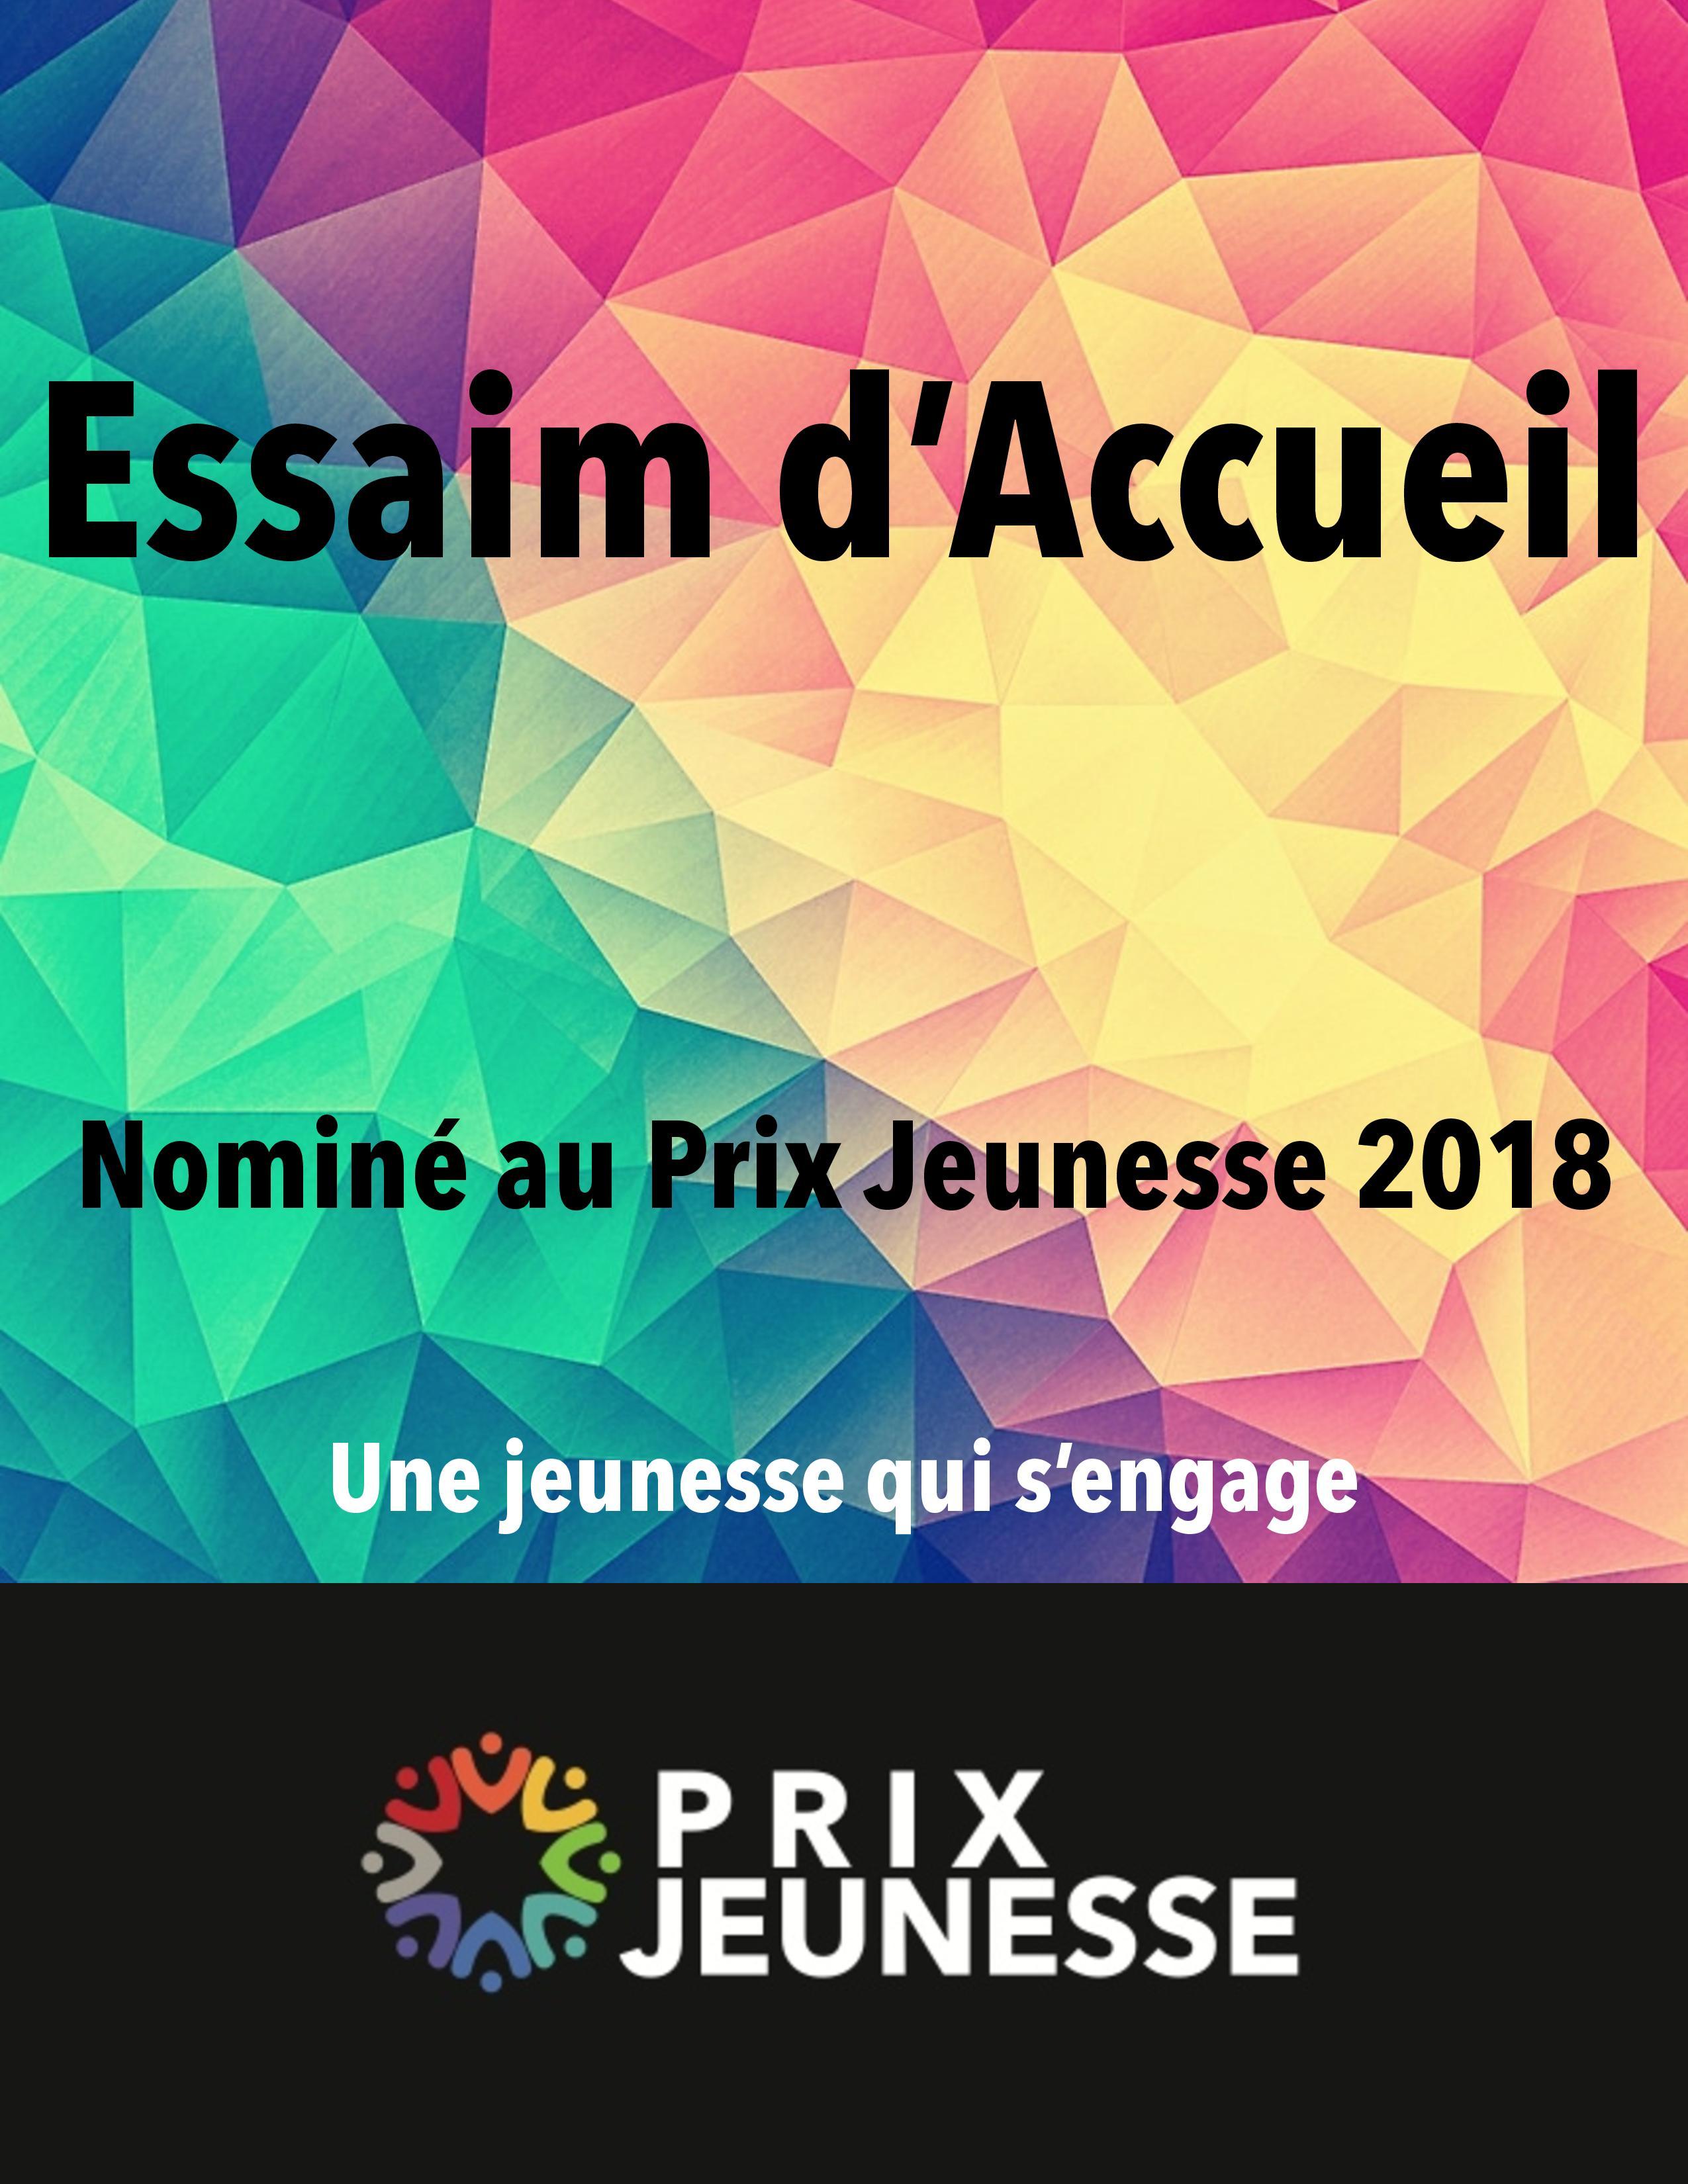 Candidat  Essaim d'Accueil